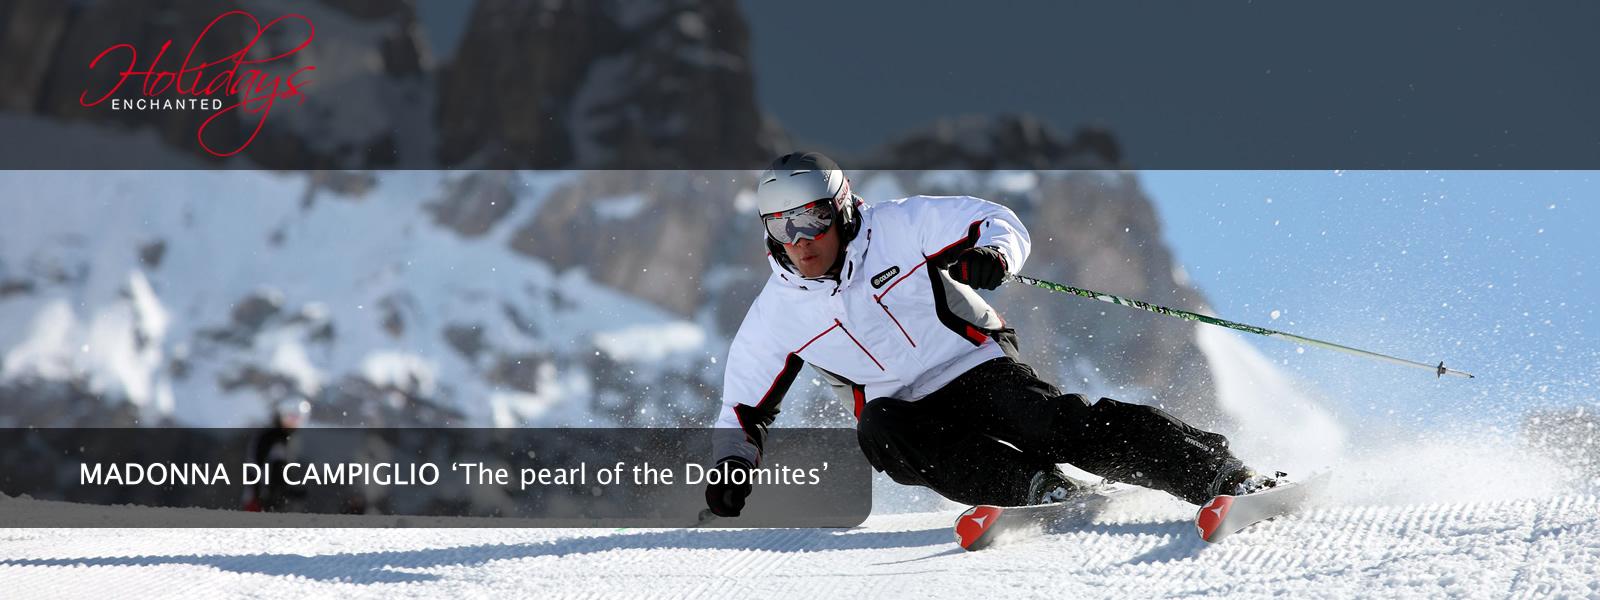 Skiiing at Madonna di Campiglio